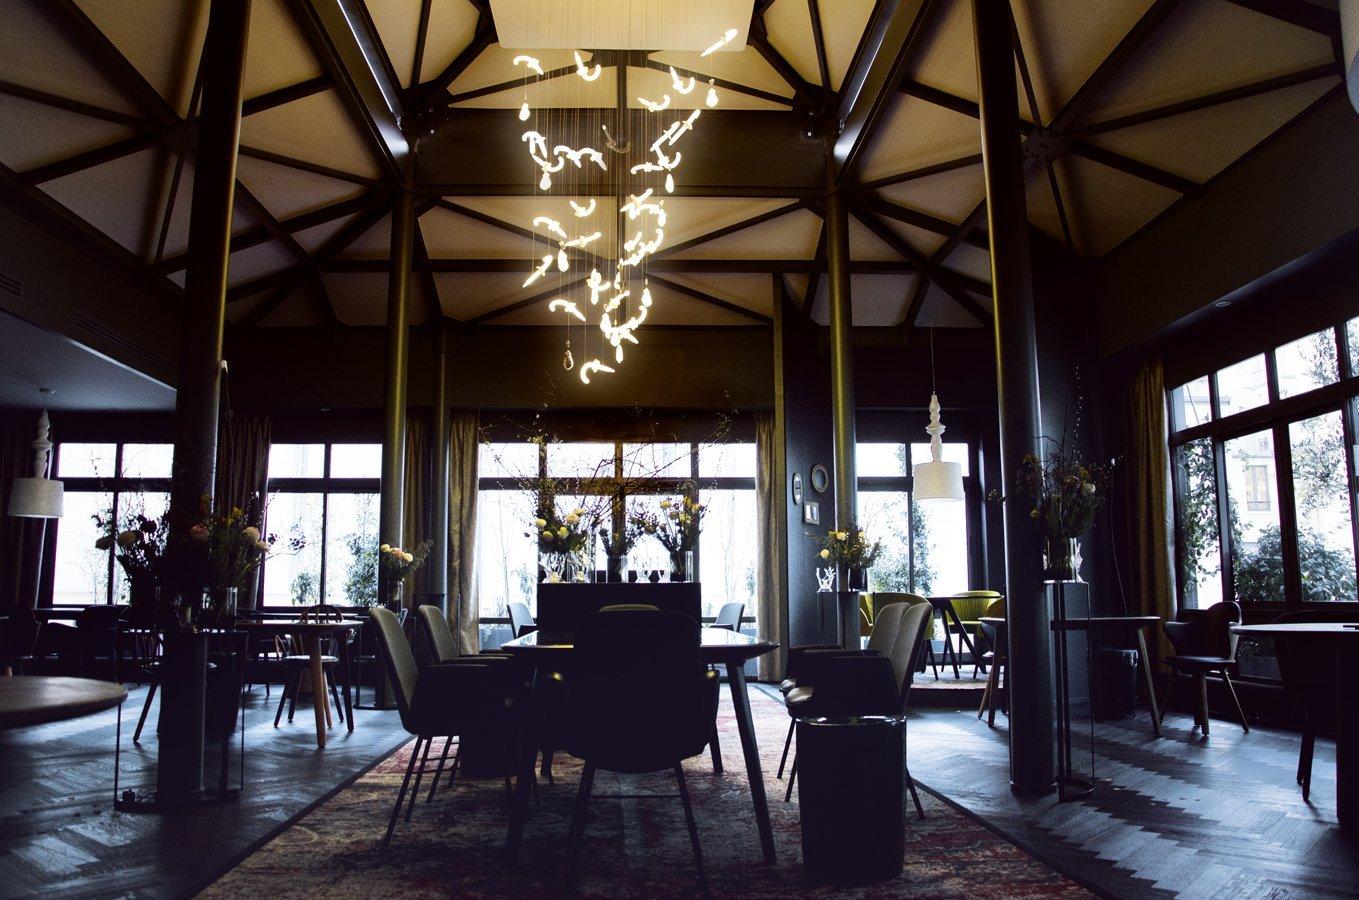 Htelsrestaurants archives beaubien design actualized bespoke chandelier restaurant lours arubaitofo Gallery